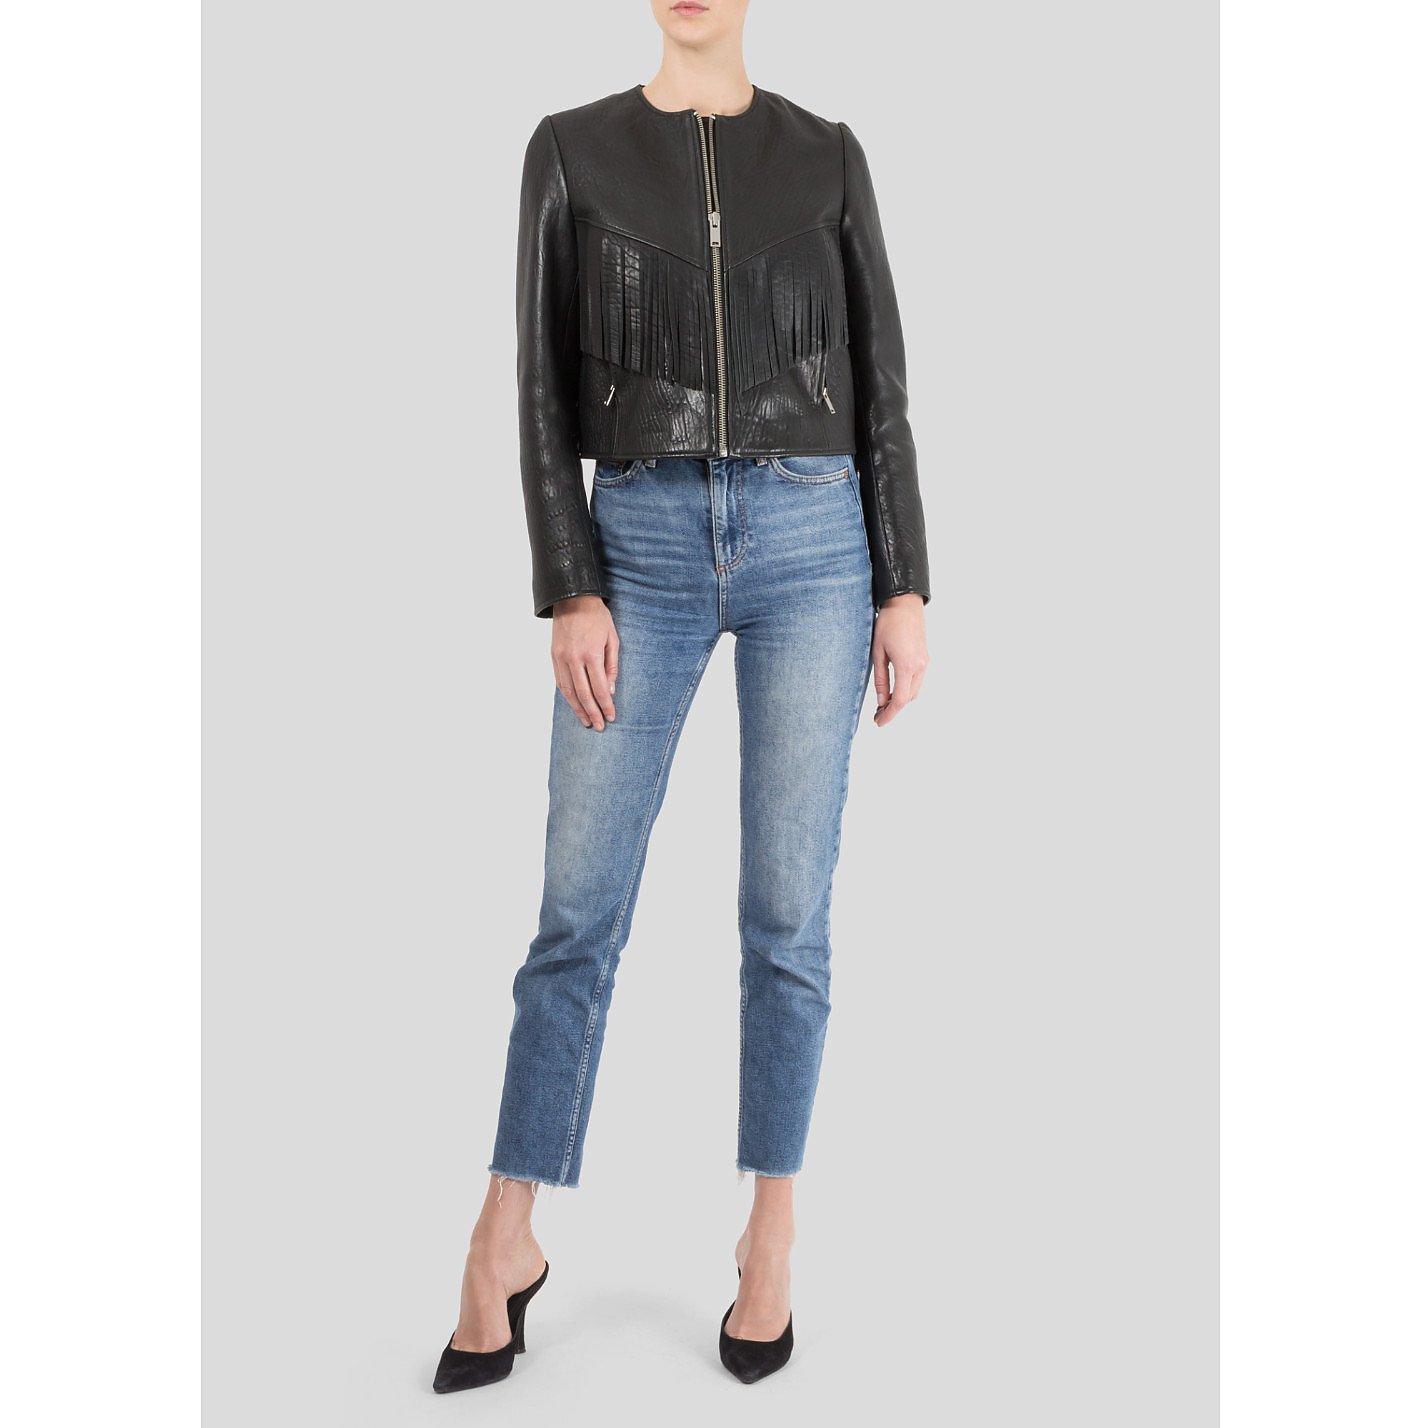 Isabel Marant Kirk Embroidered Leather Jacket